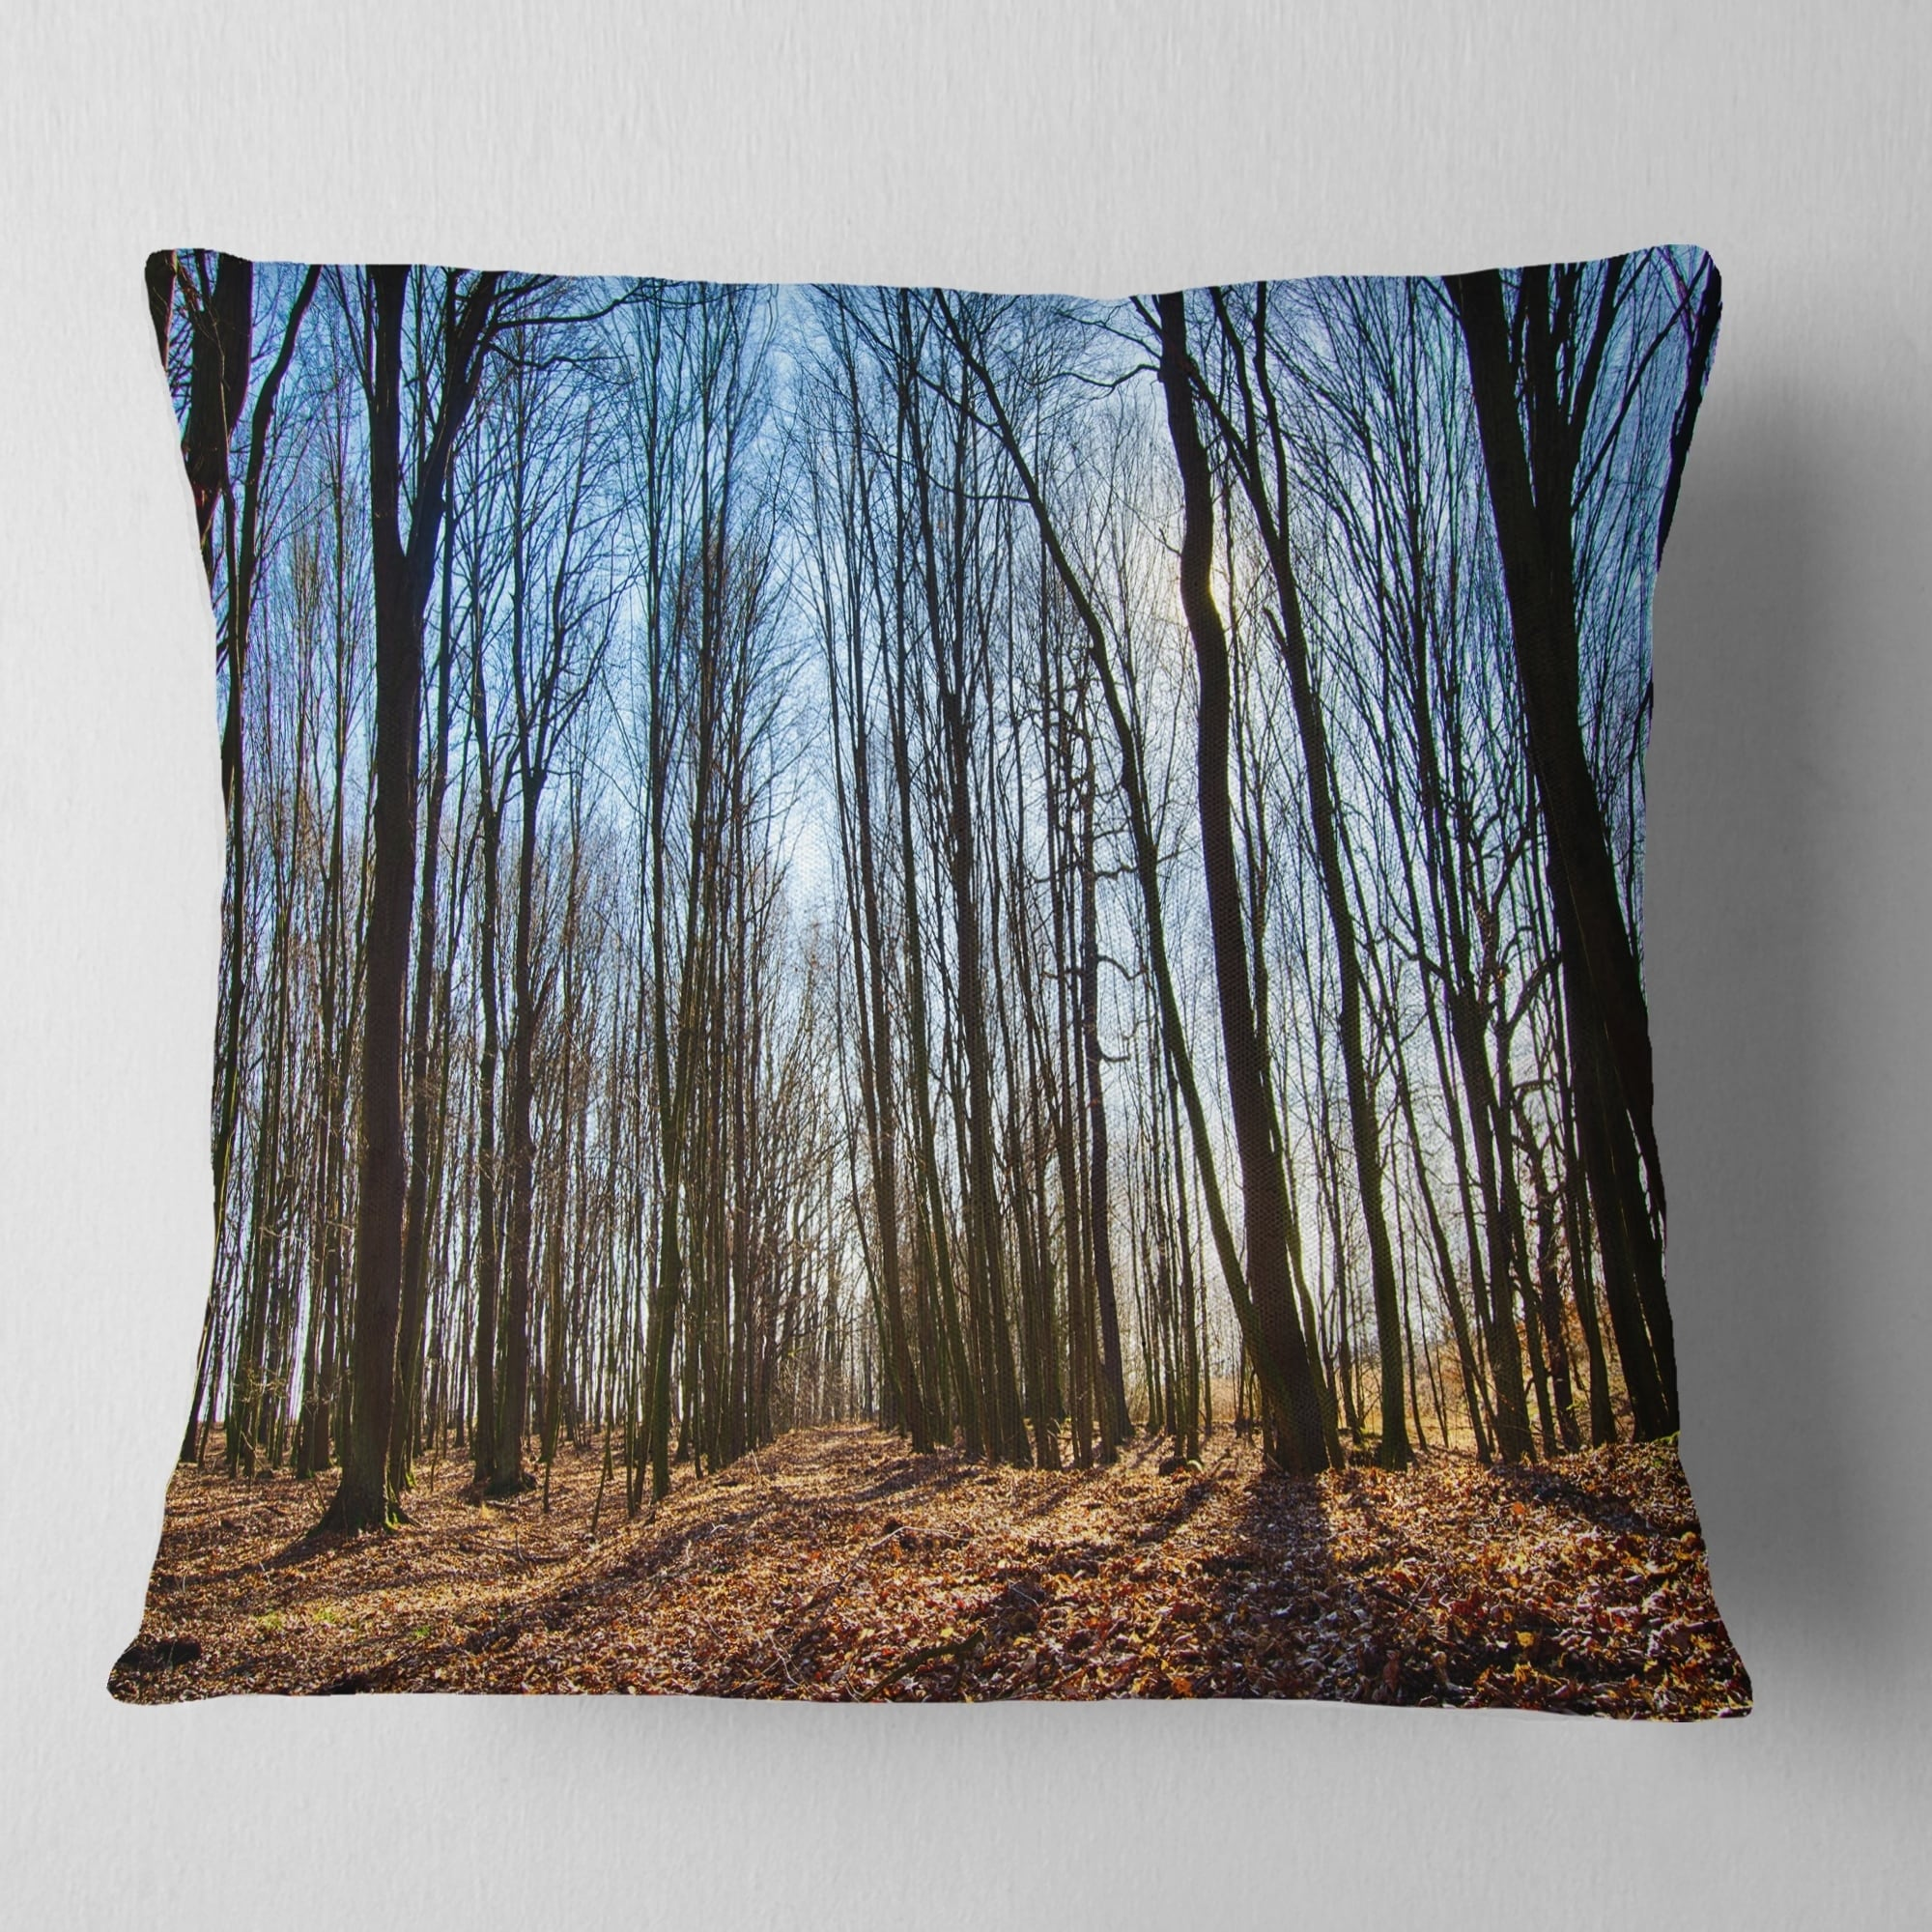 in x 20 in Sofa Throw Pillow 12 in Designart CU13998-12-20 Dark Trees Sunrise Forest Lumbar Cushion Cover for Living Room